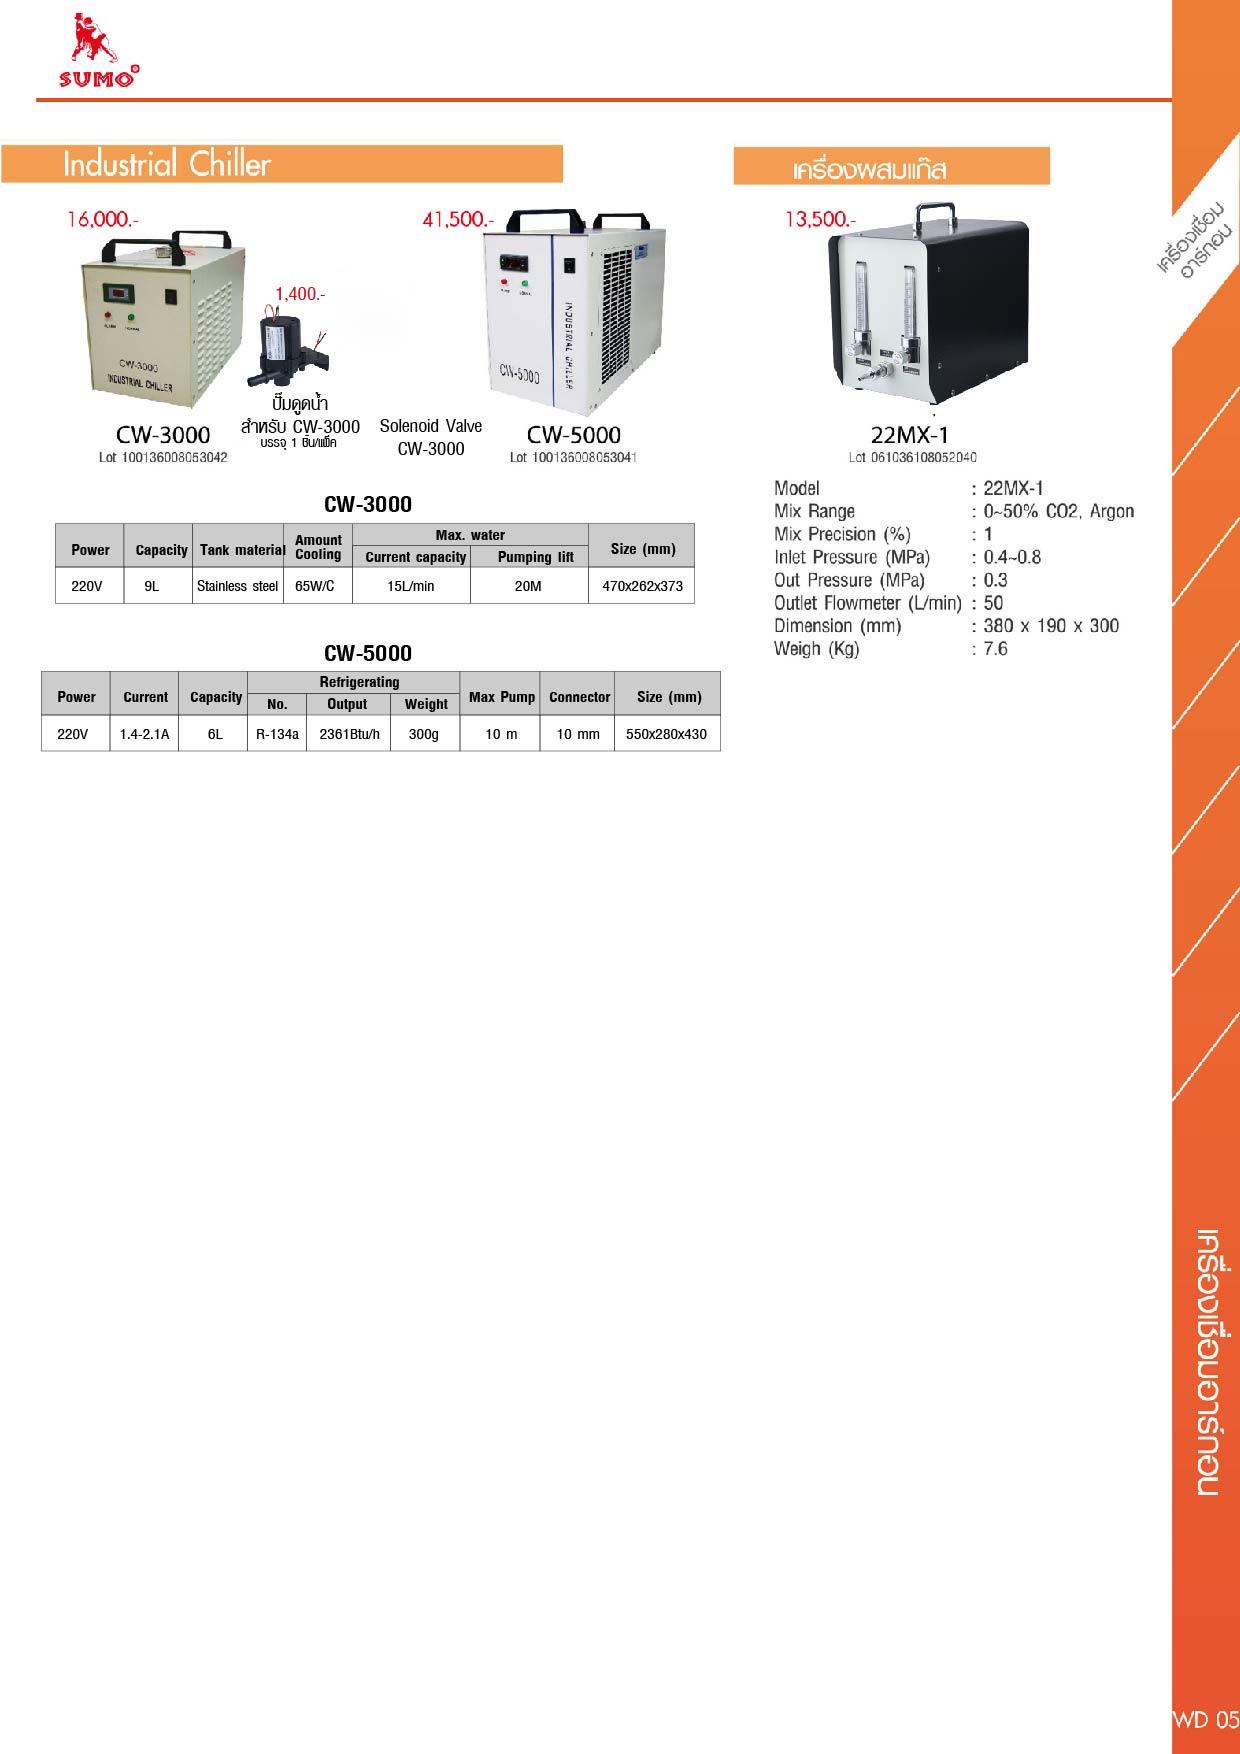 (14/16) Tig/Stick WP300 AC/DC